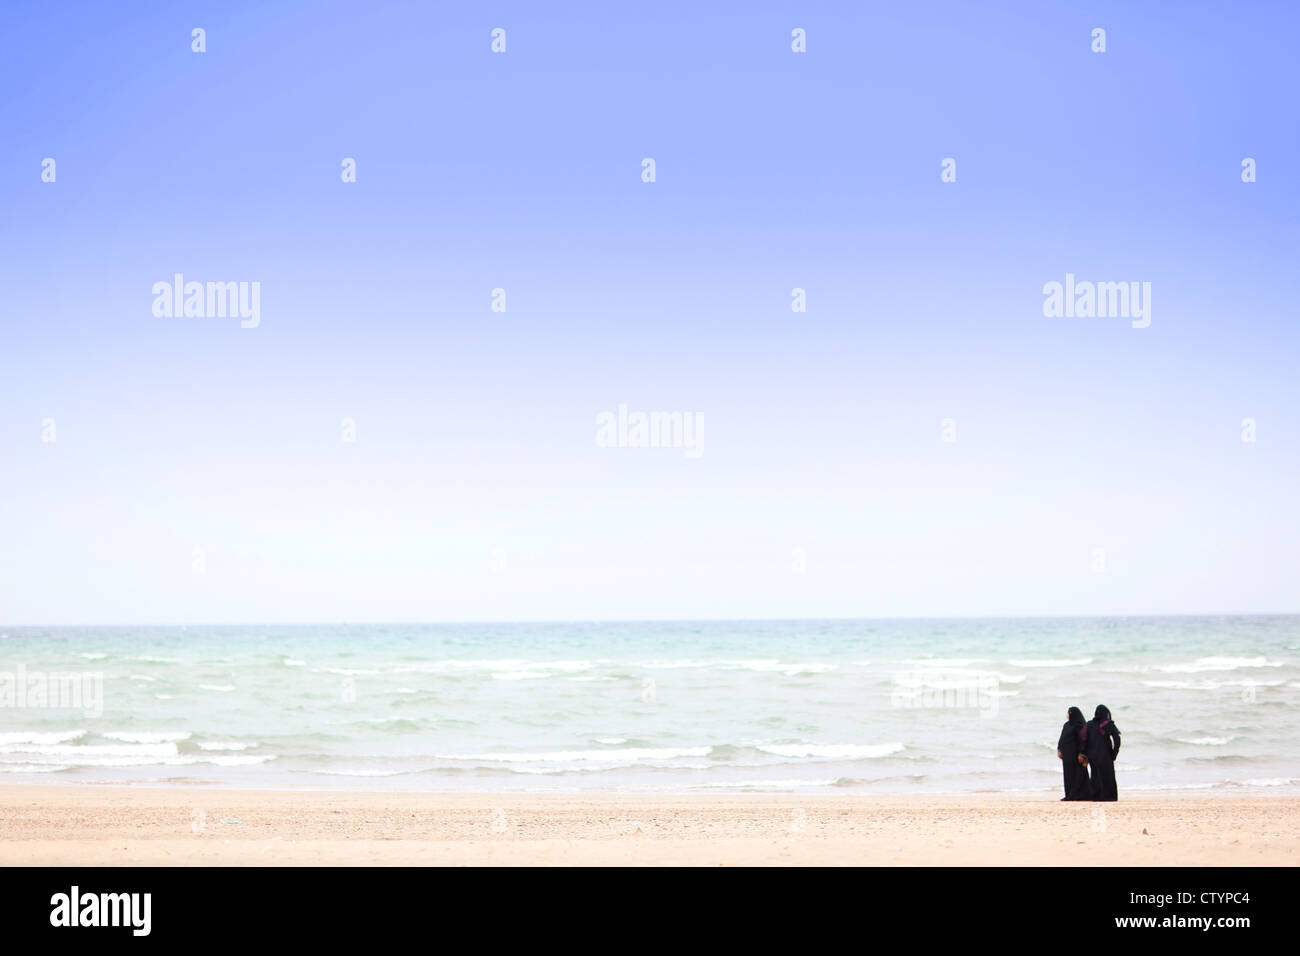 Muslim women near the sea - Stock Image